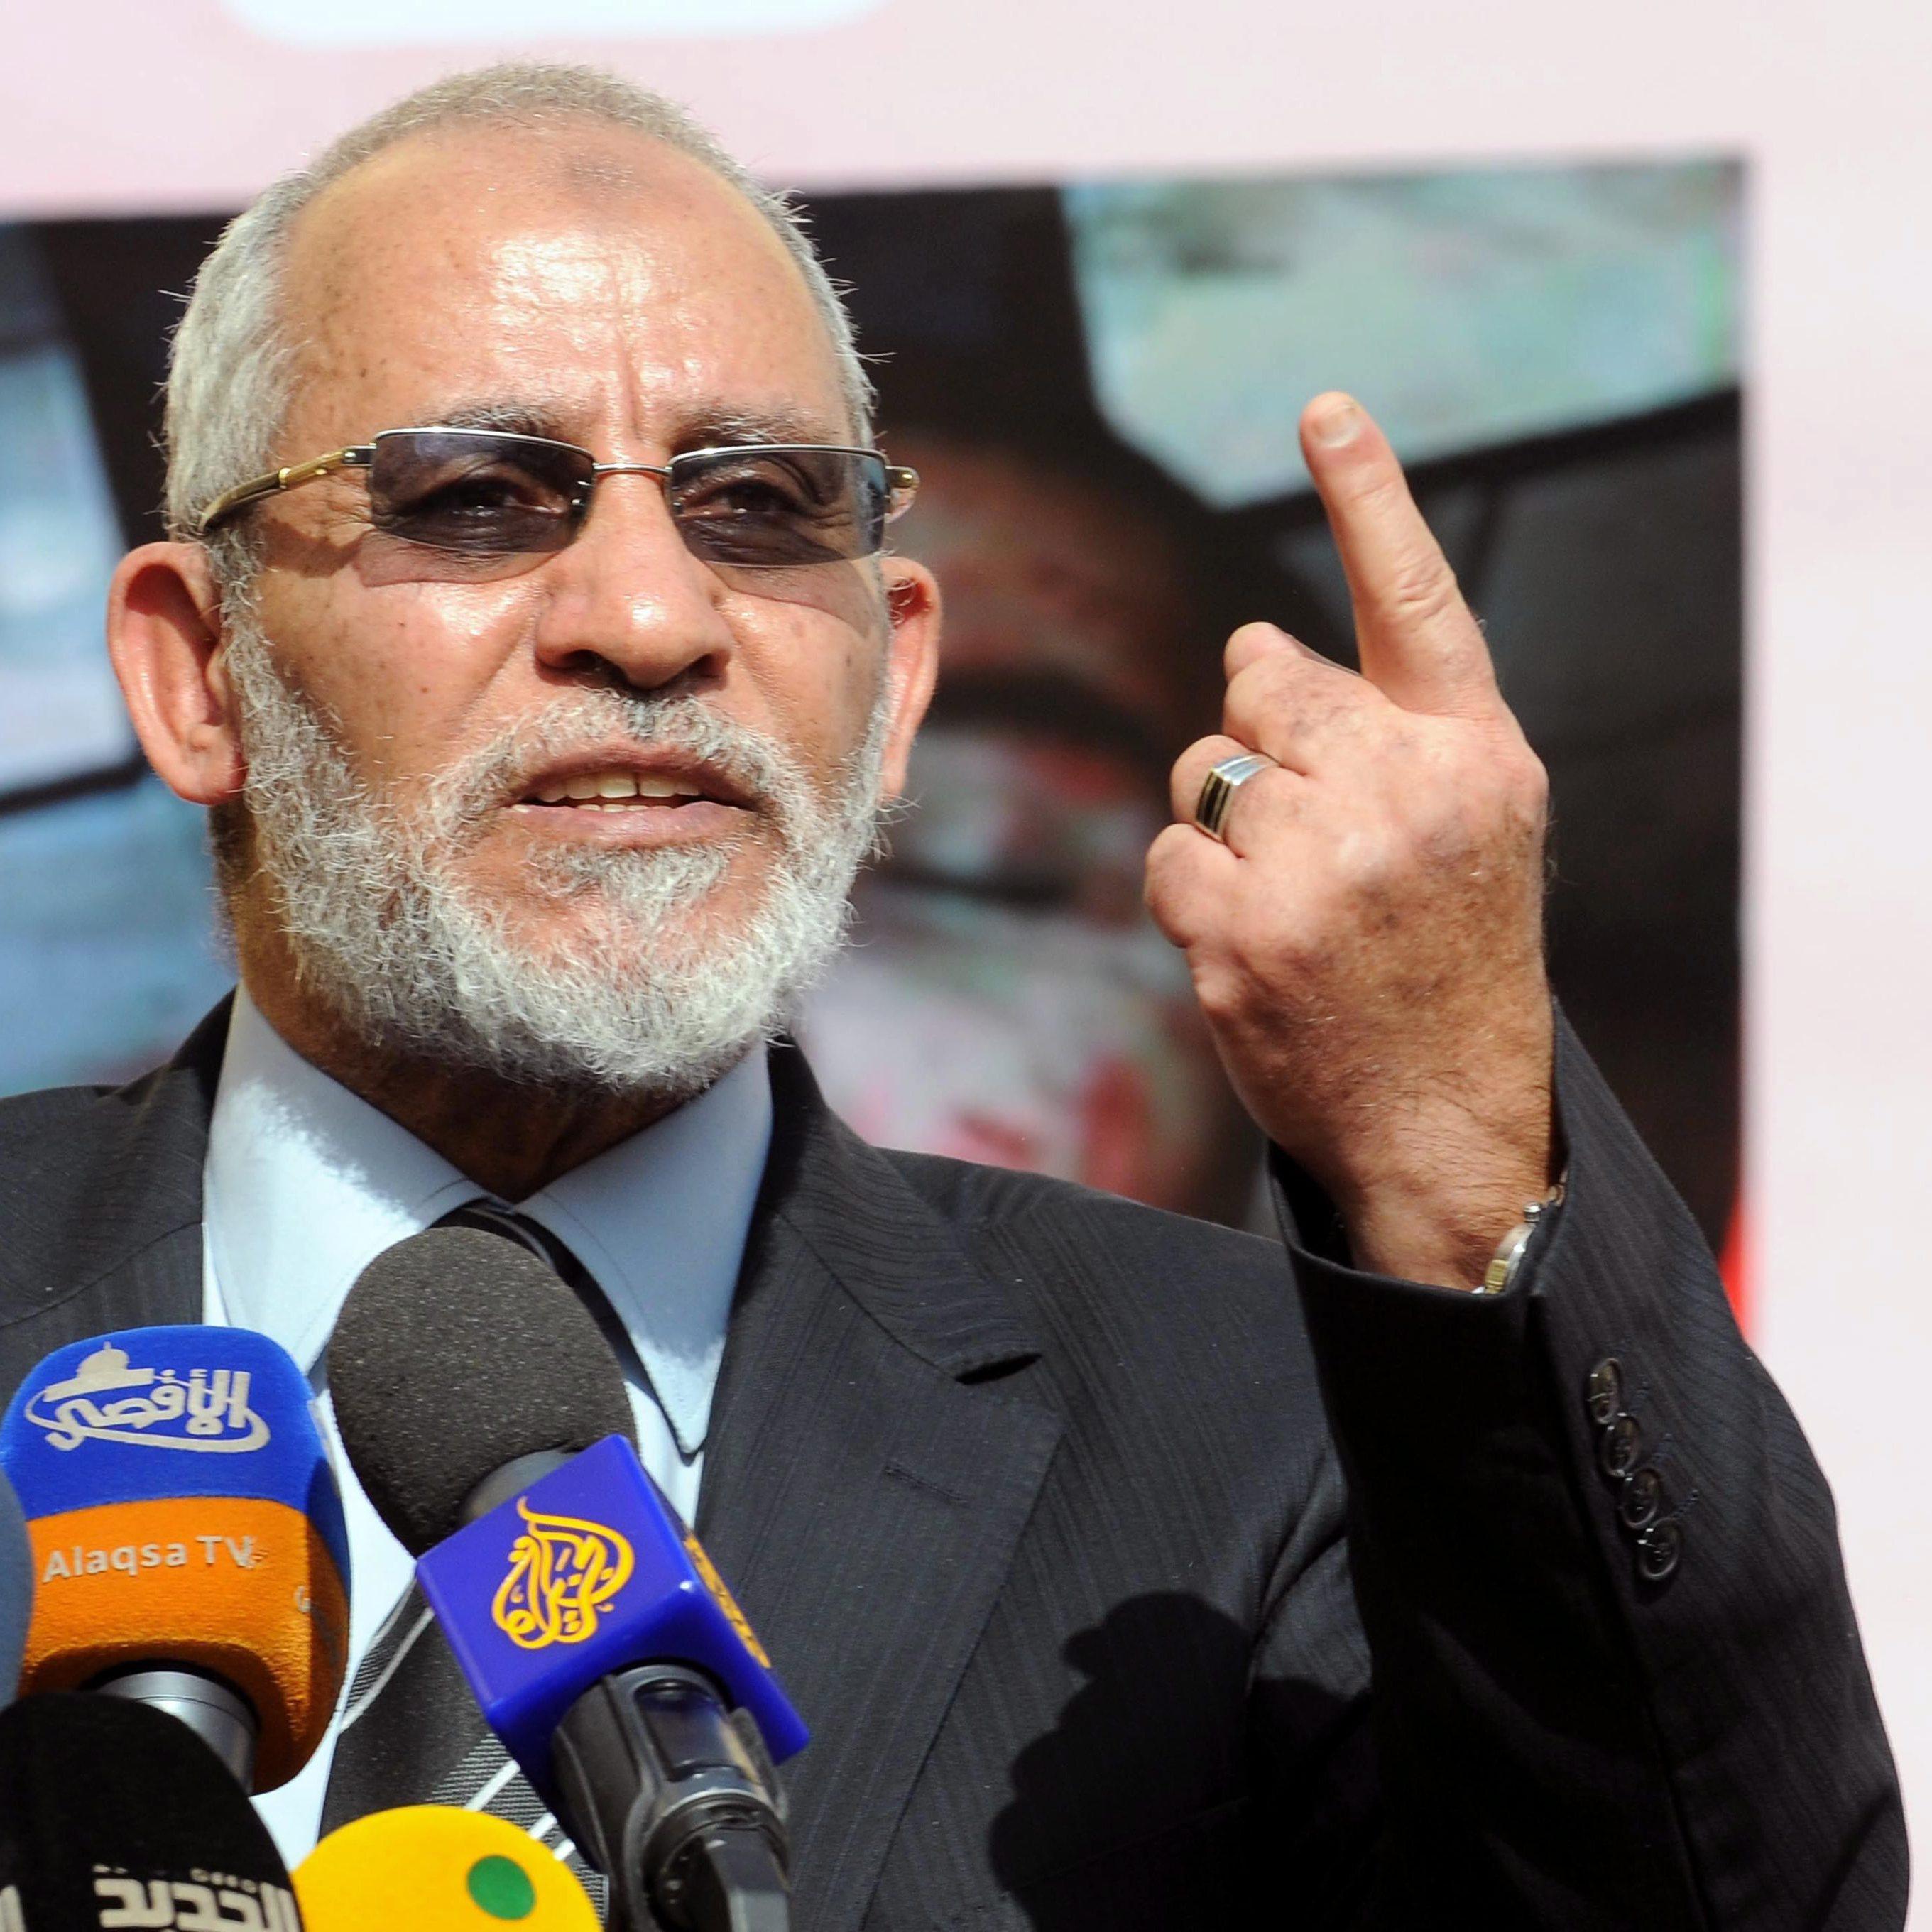 Reports: Egypt Orders Arrest Of Muslim Brotherhood Leader